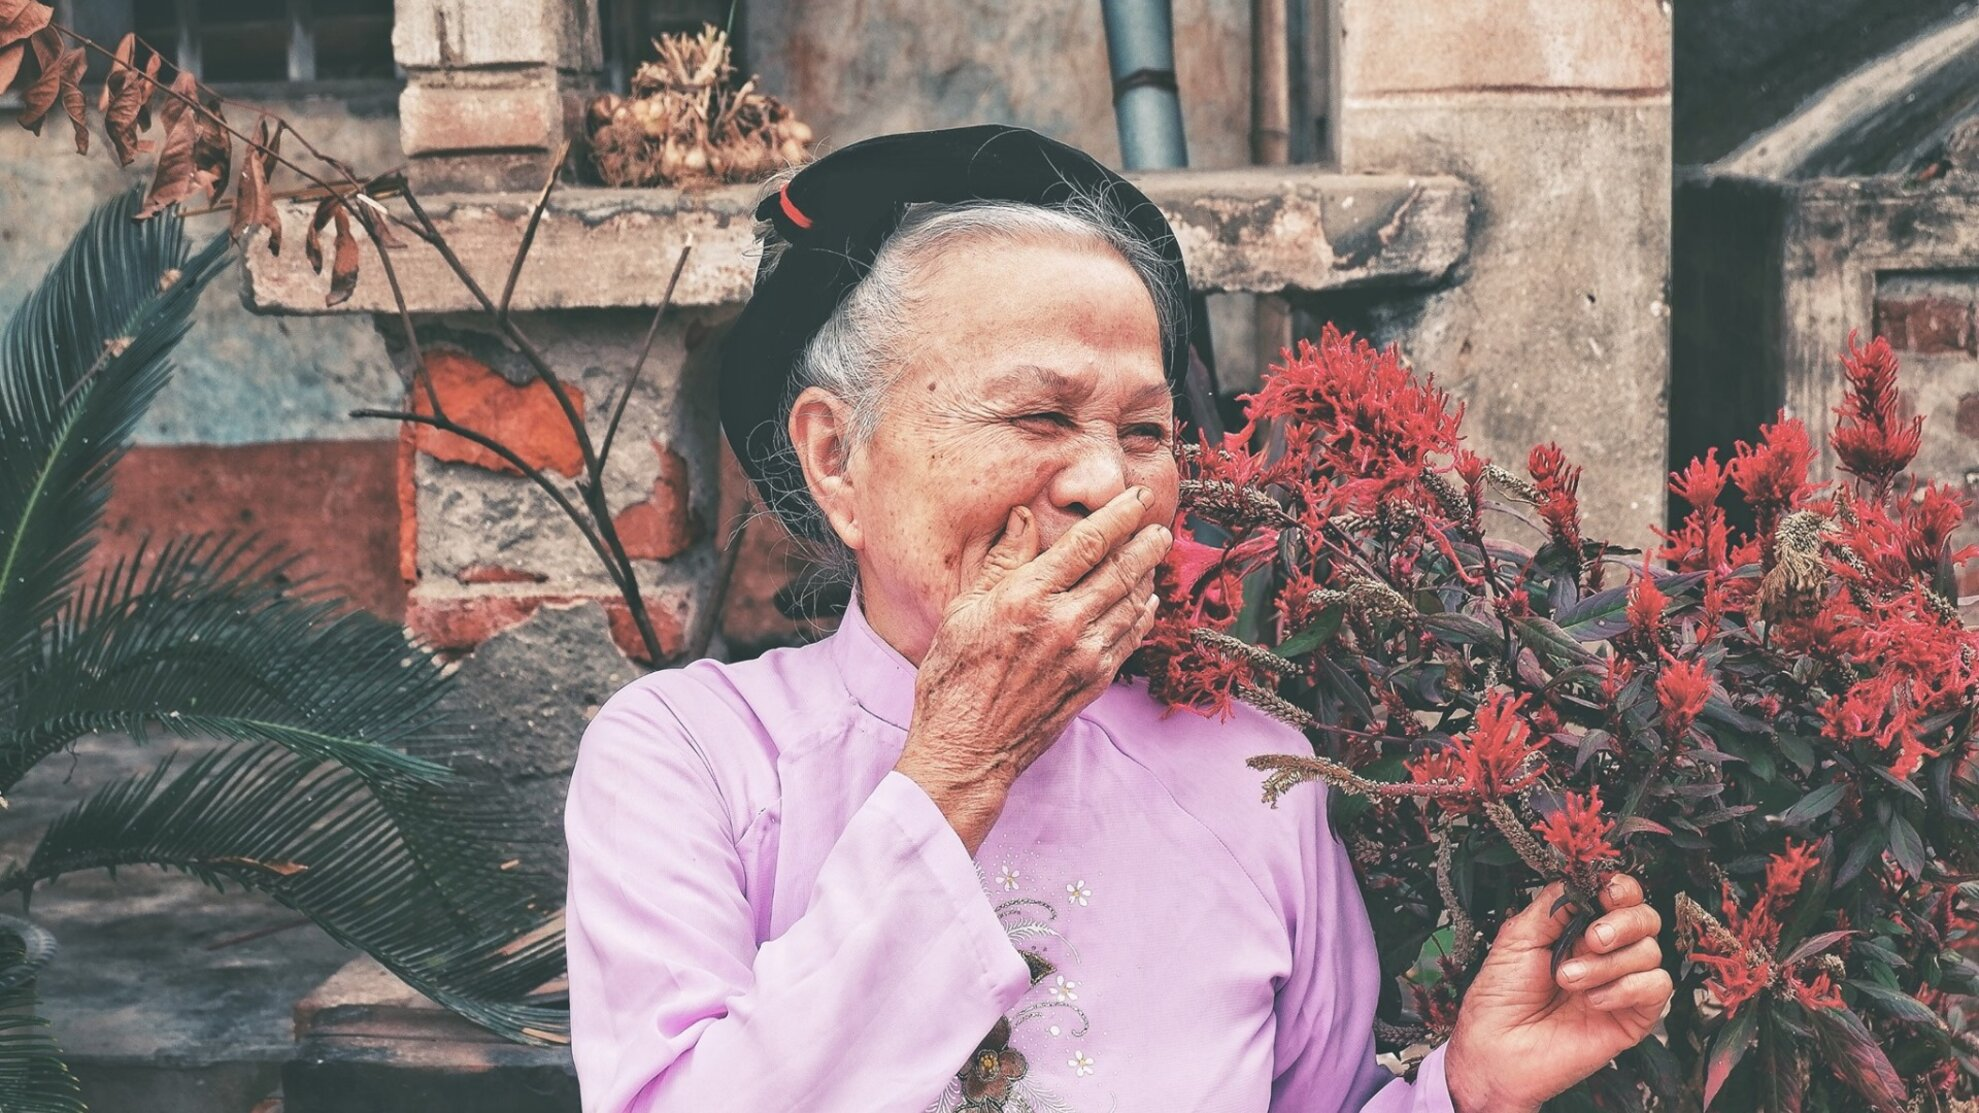 Öreg fiatalok – Fiatal öregek